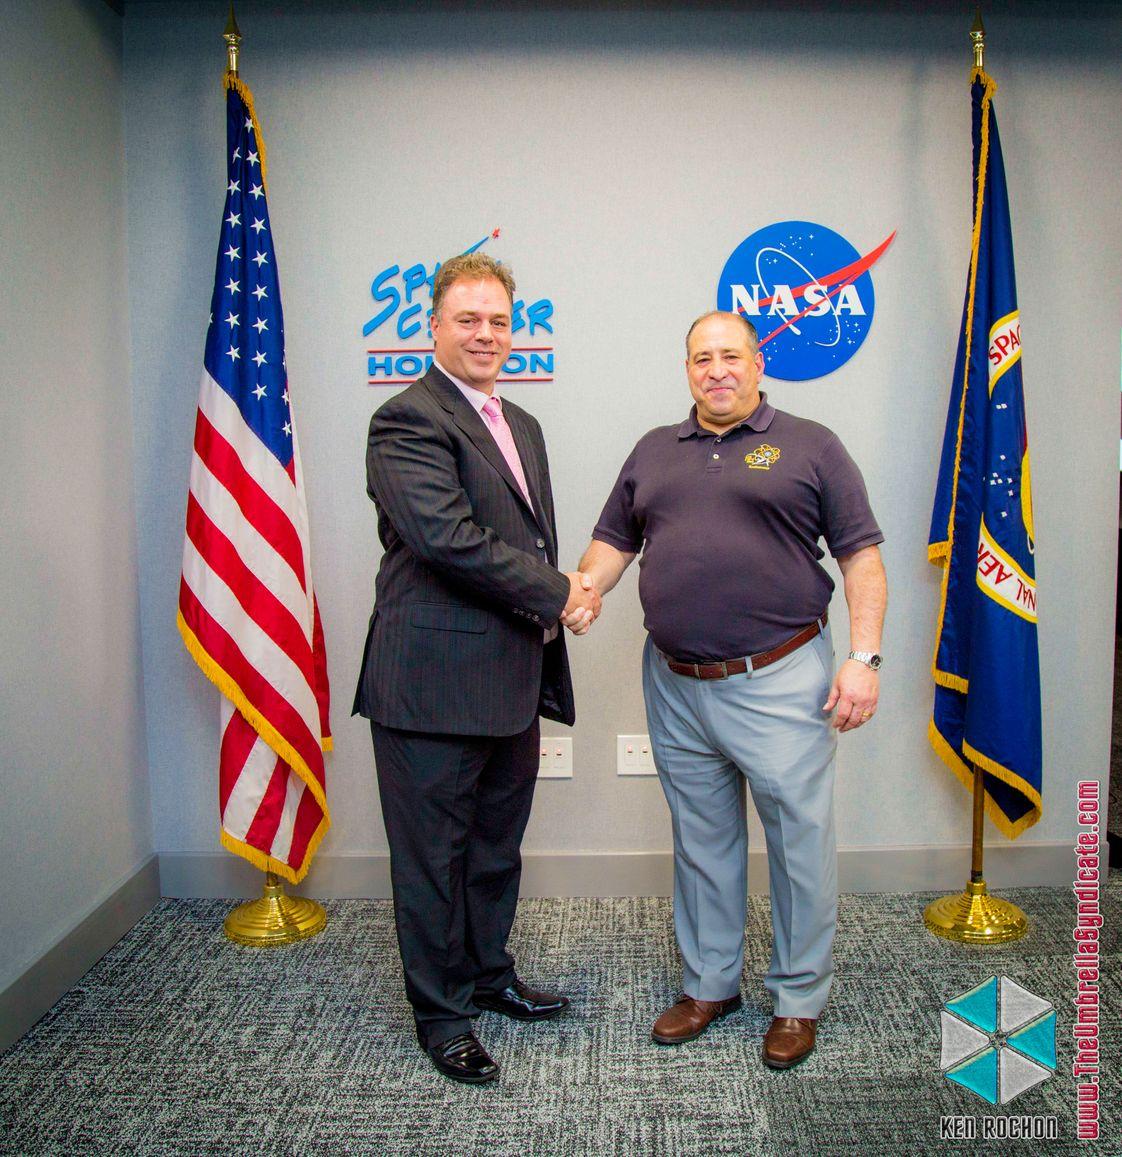 Ernesto Verdugo with Astronaut Carfano in NASA